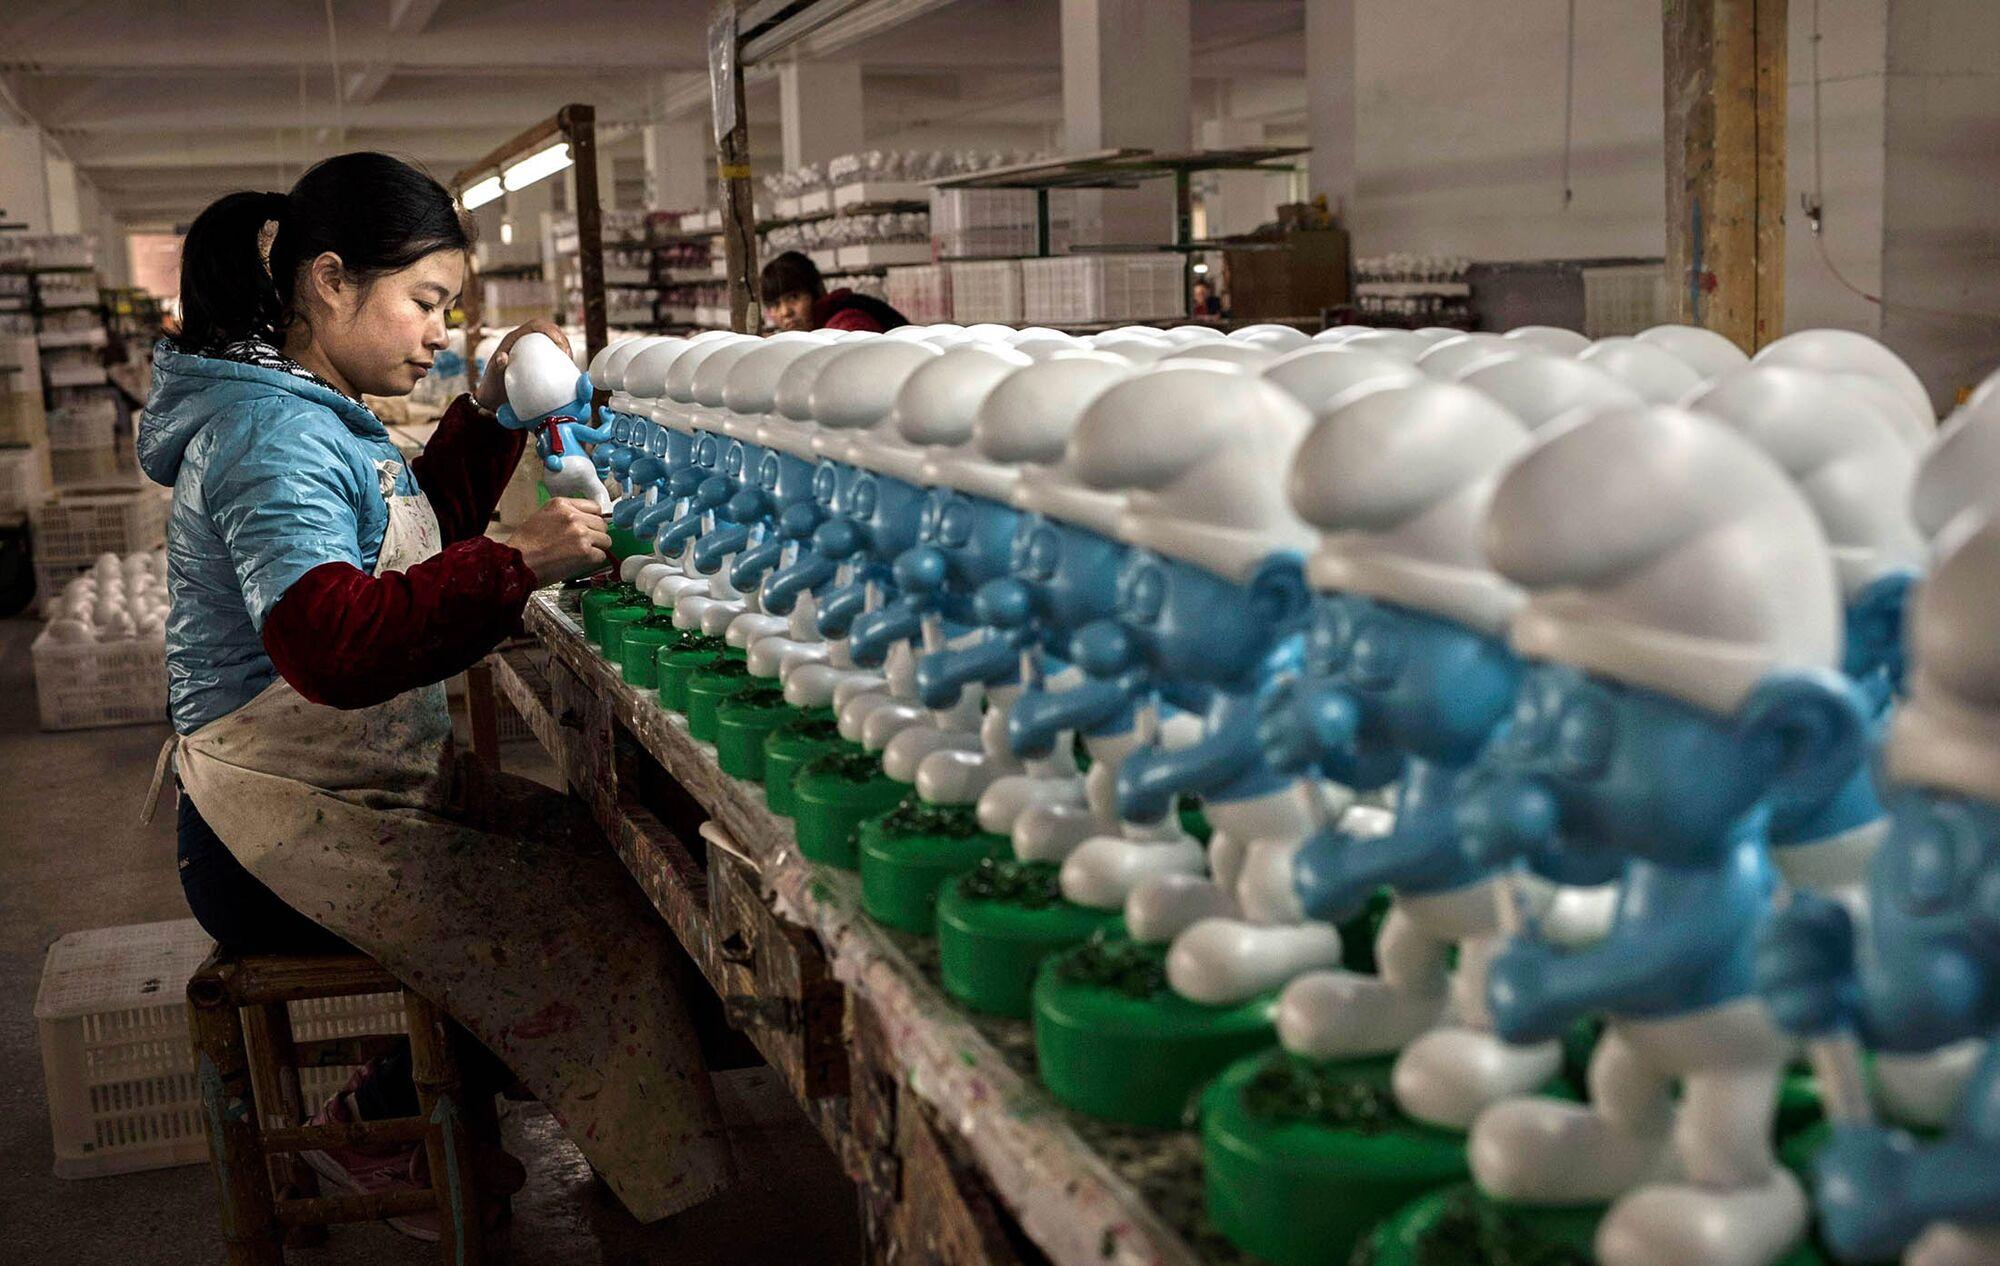 China Would Outlast U.S. in Trade War, Billion-Dollar Fund Says